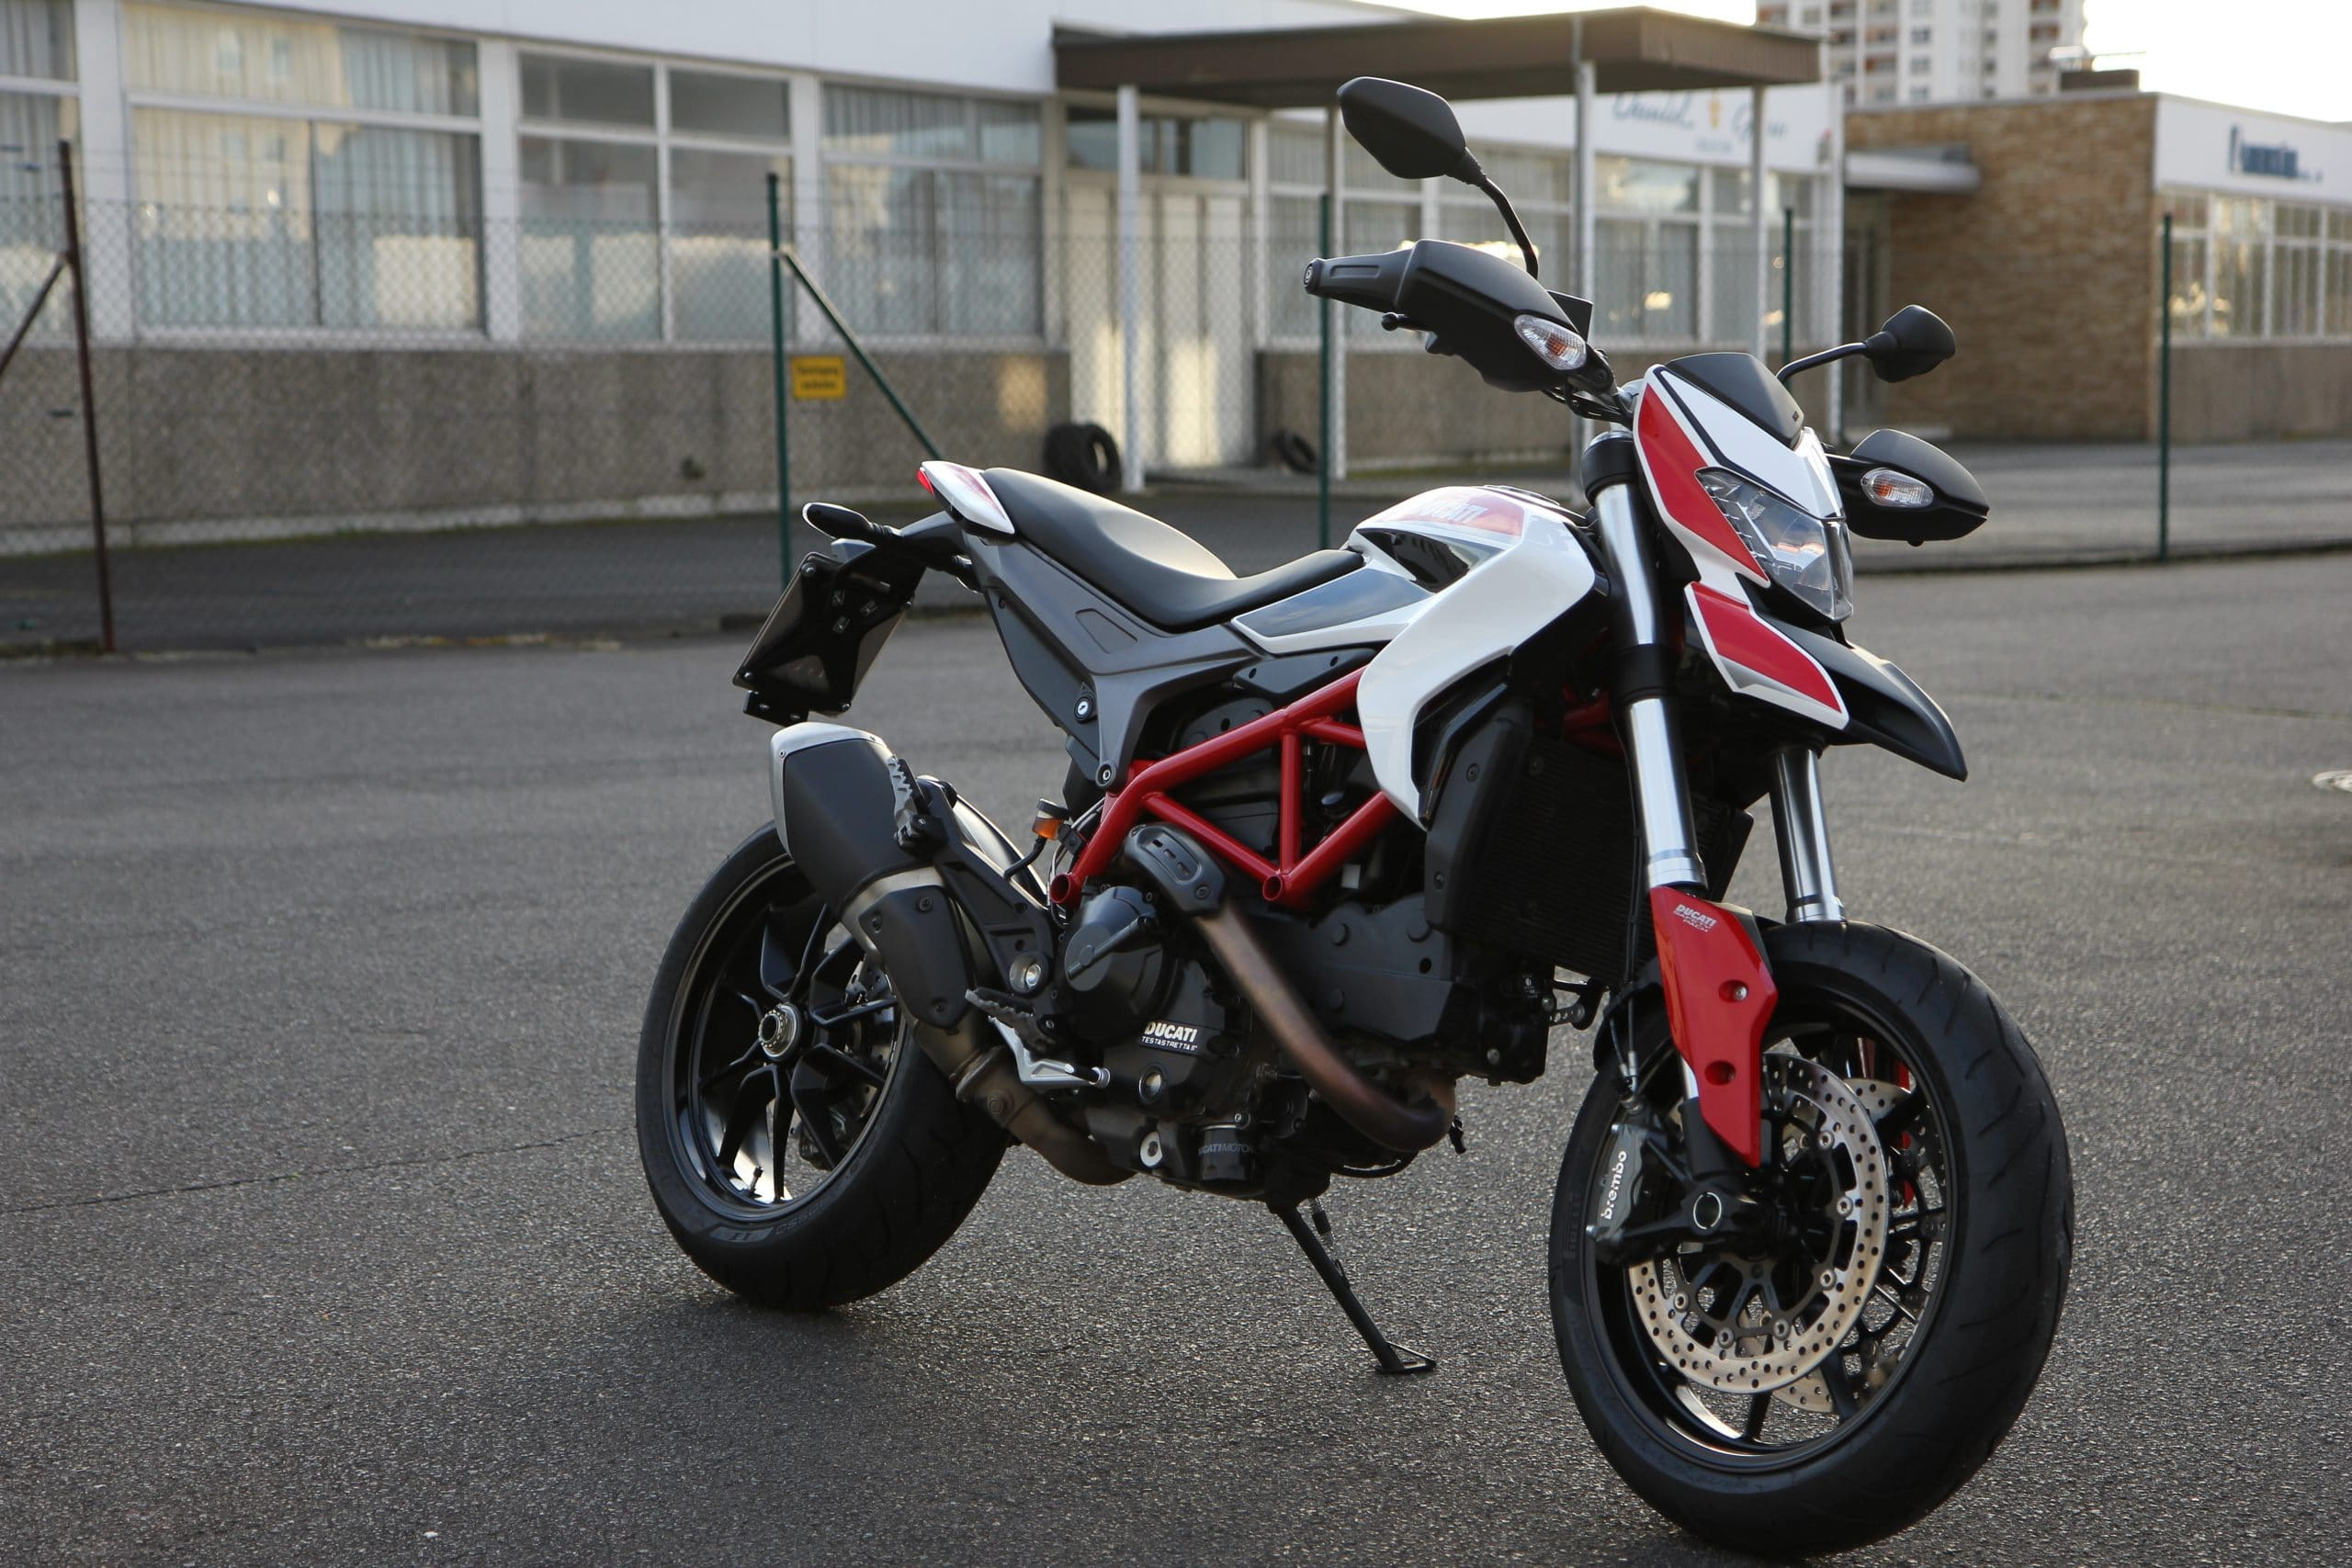 Ducati Multistrada 1100 2009